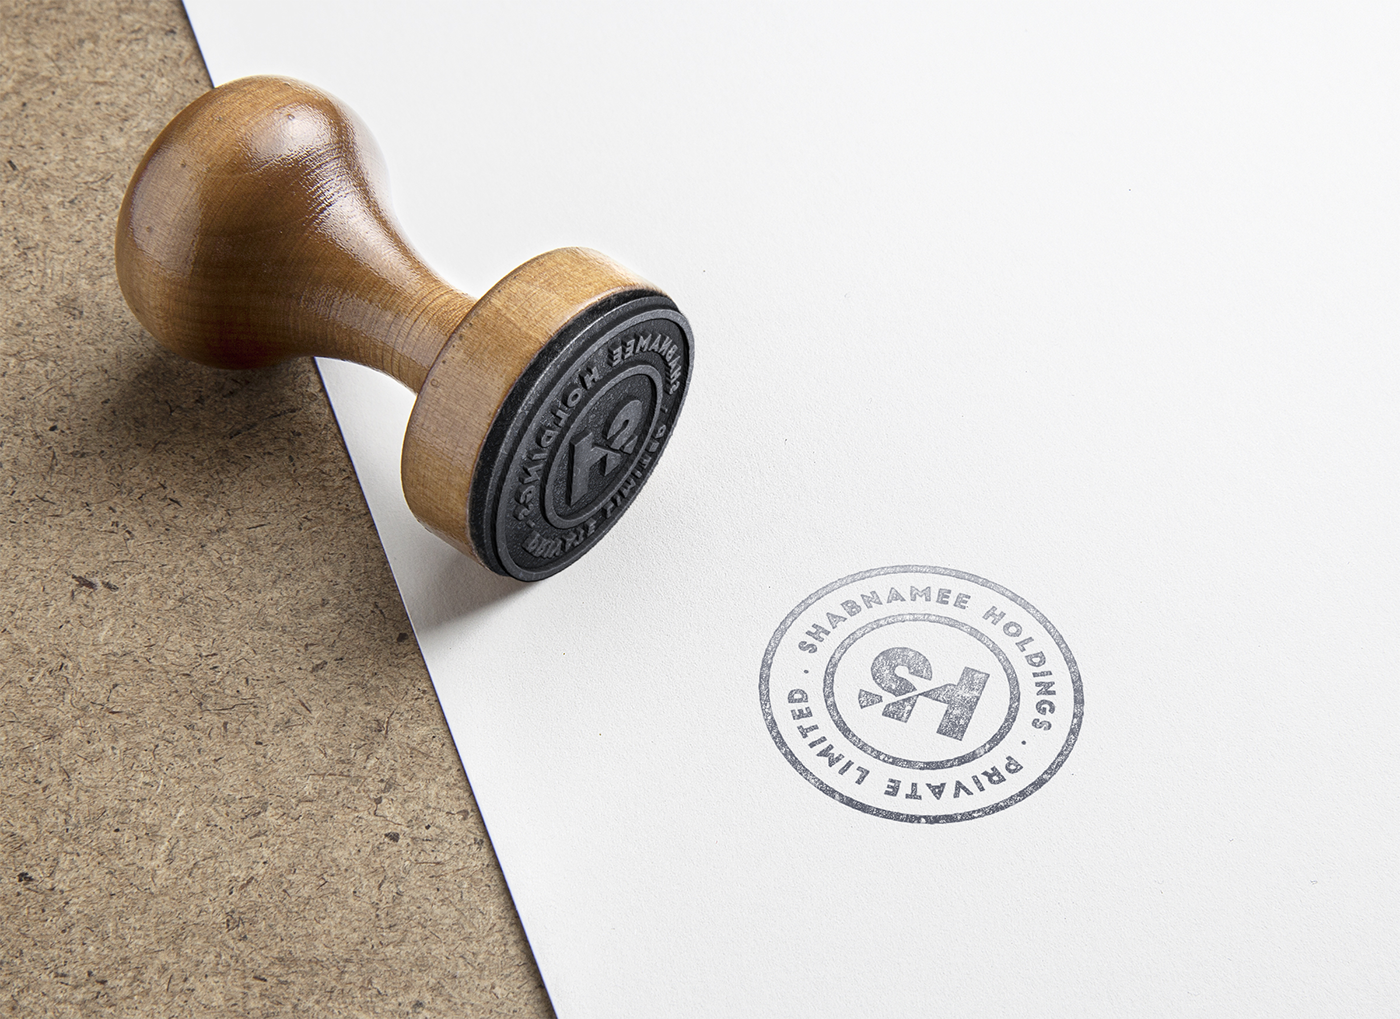 logo moden blue professional holdings Maldives grey stylish clean elegent design aqua business Rebrand